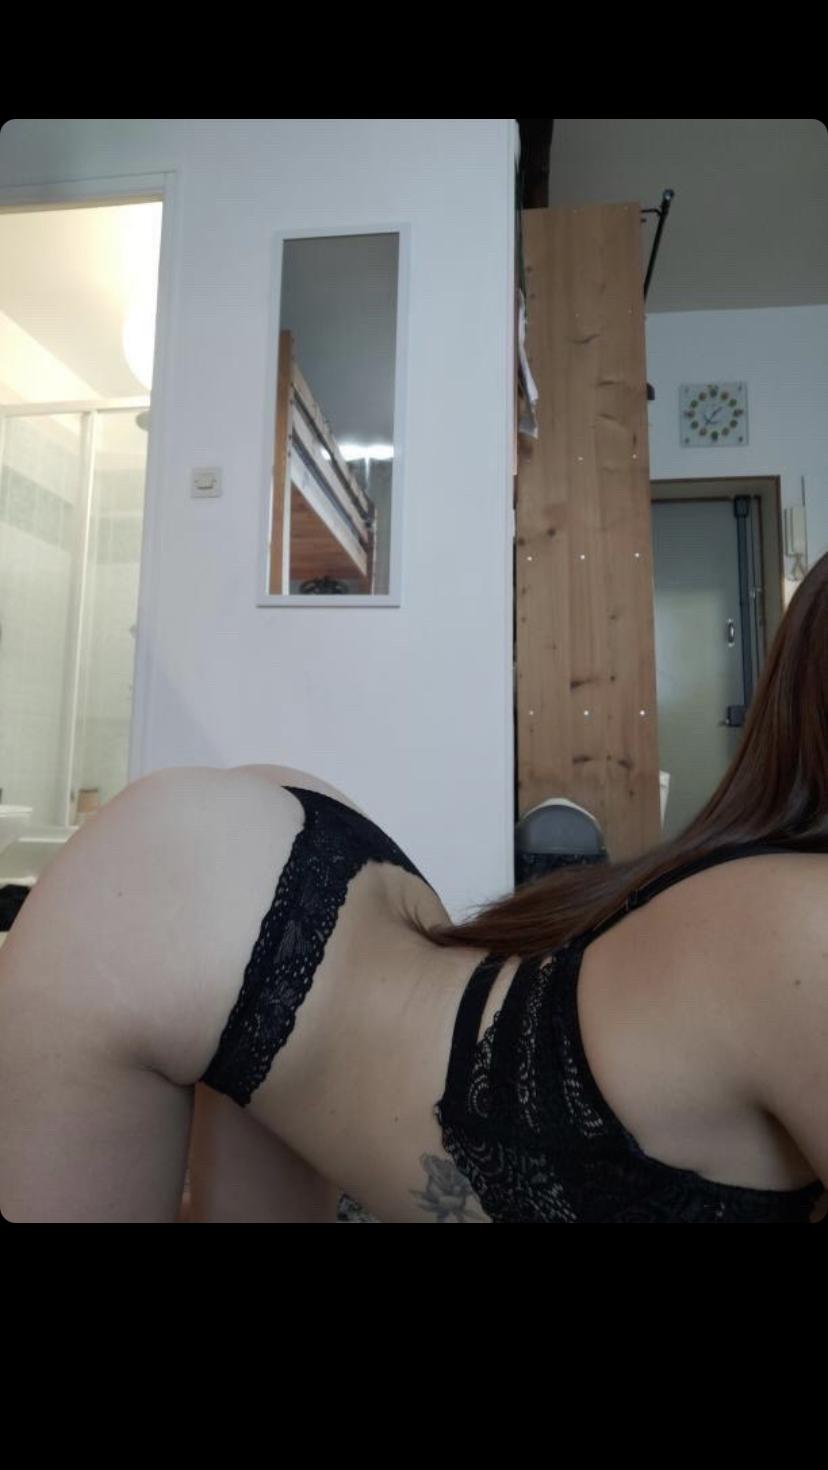 Eloise9603